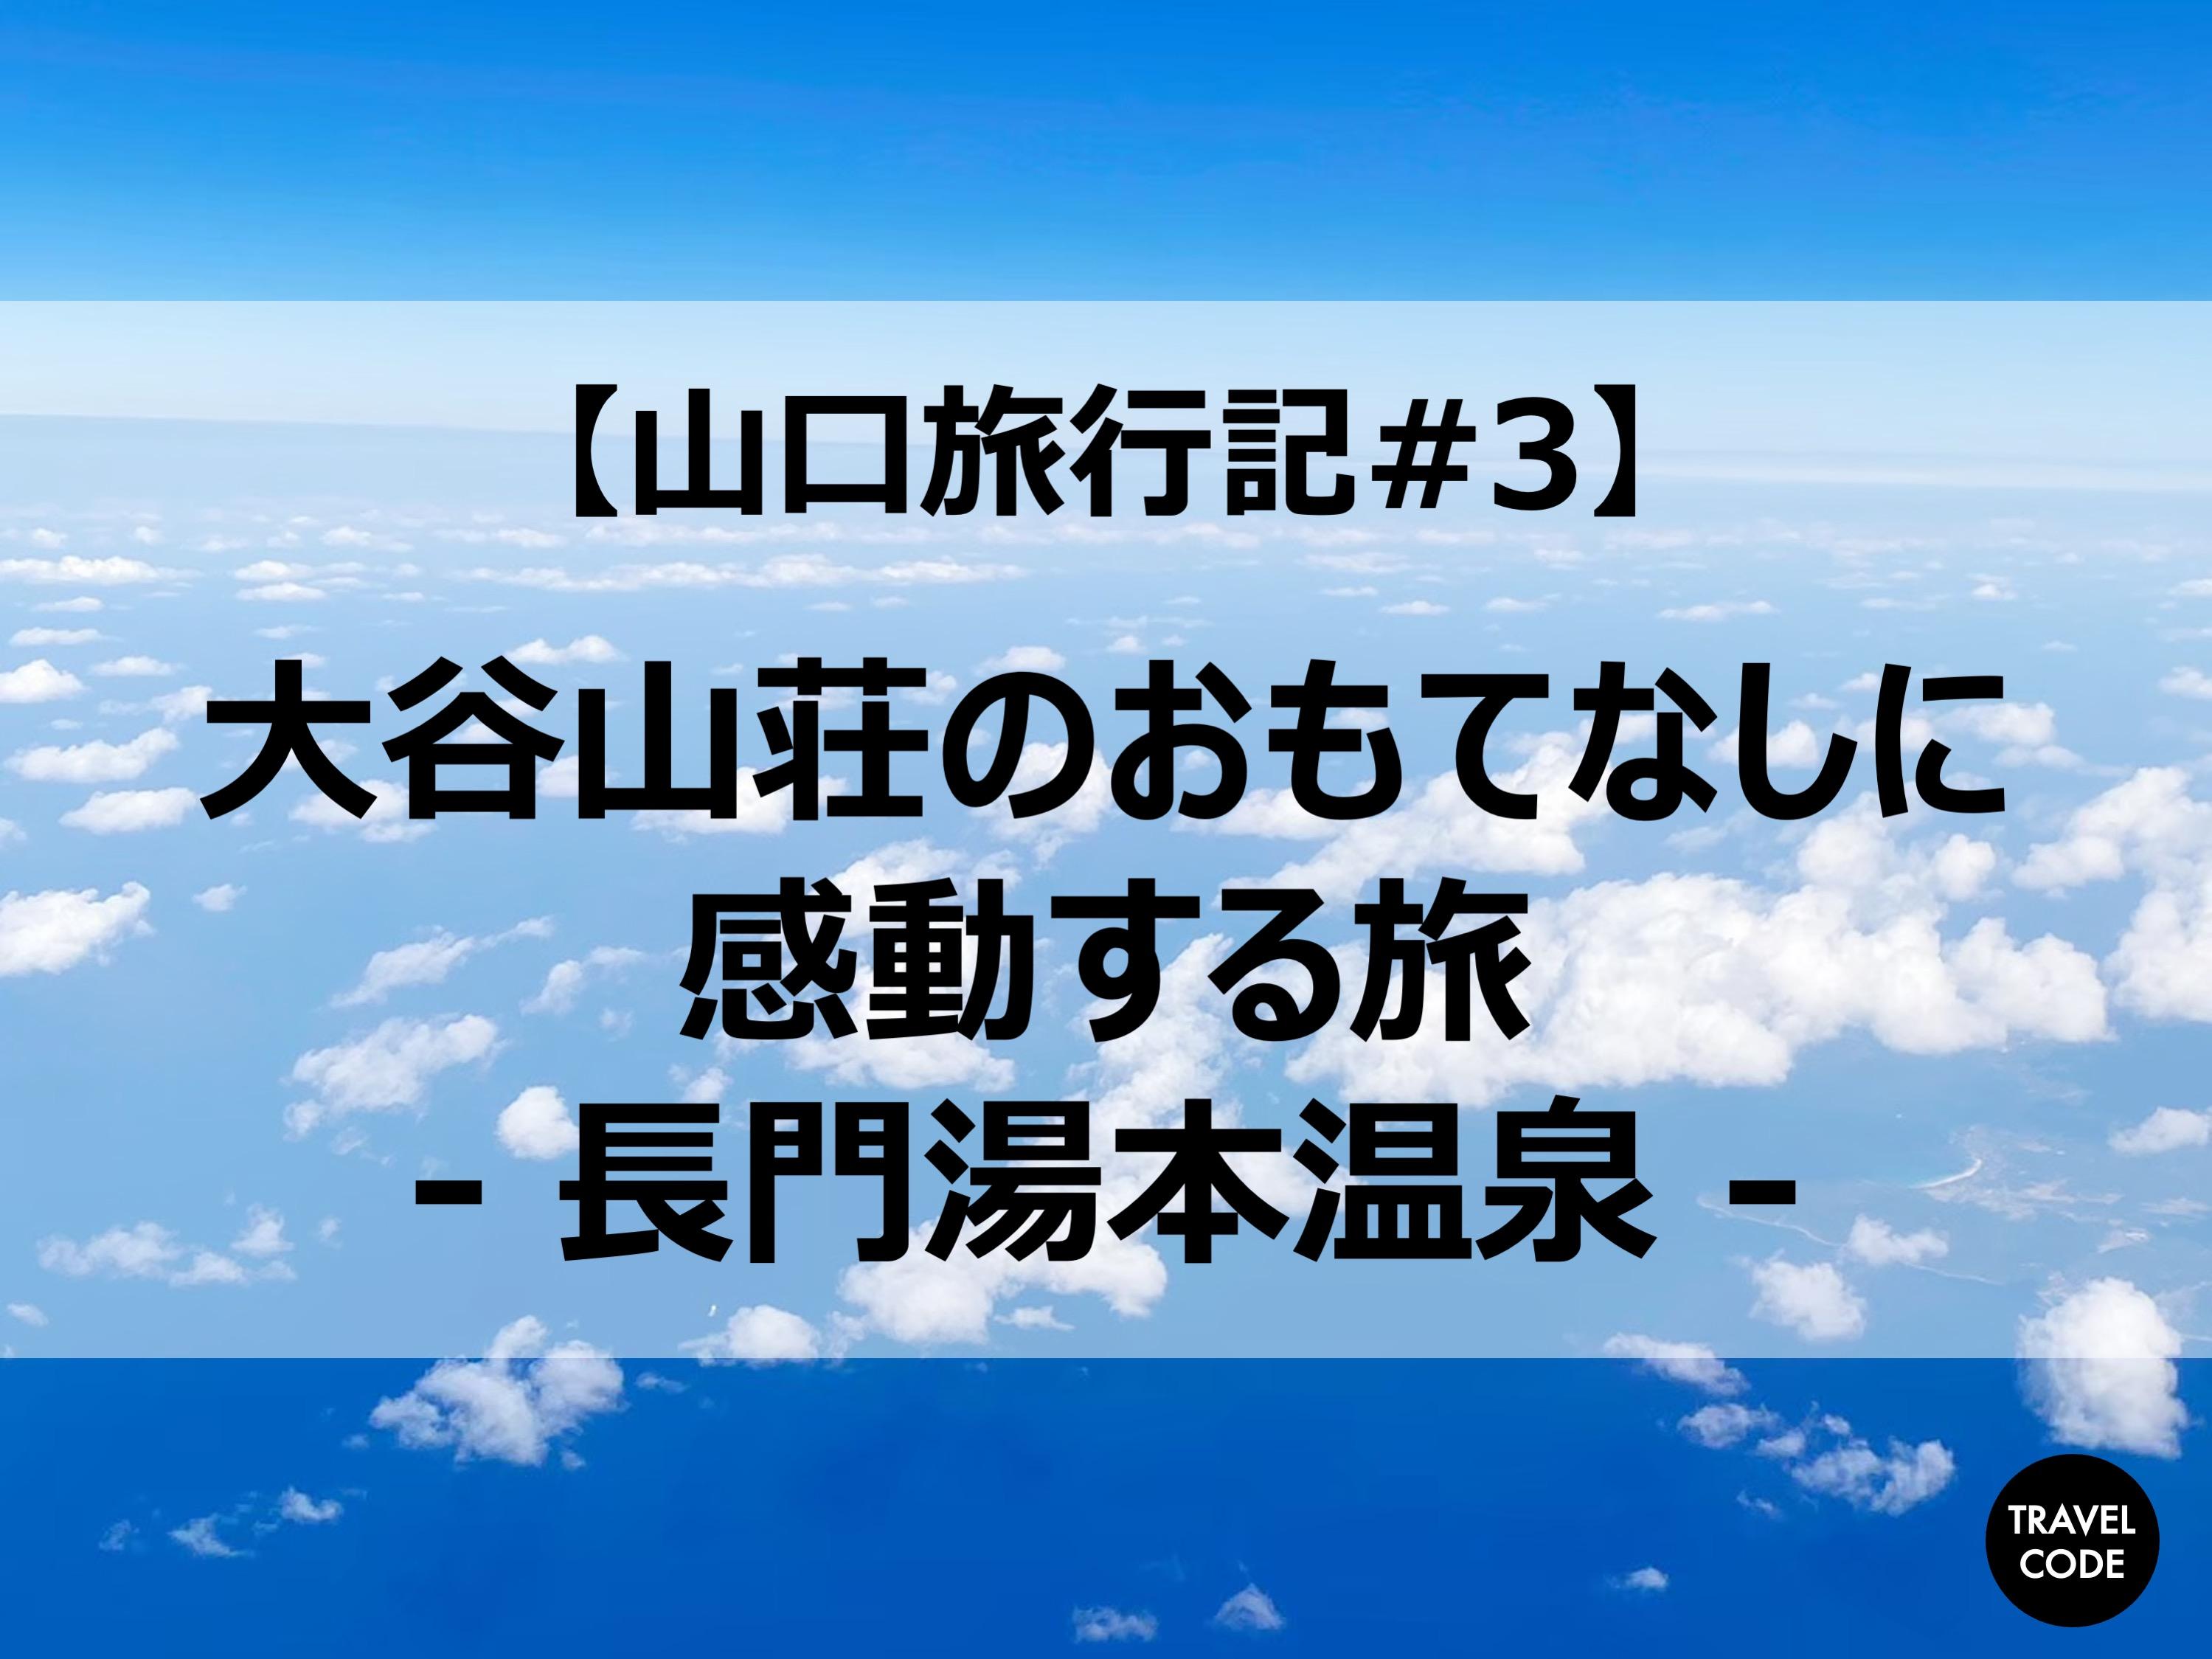 f:id:koala_log:20210909163800j:plain